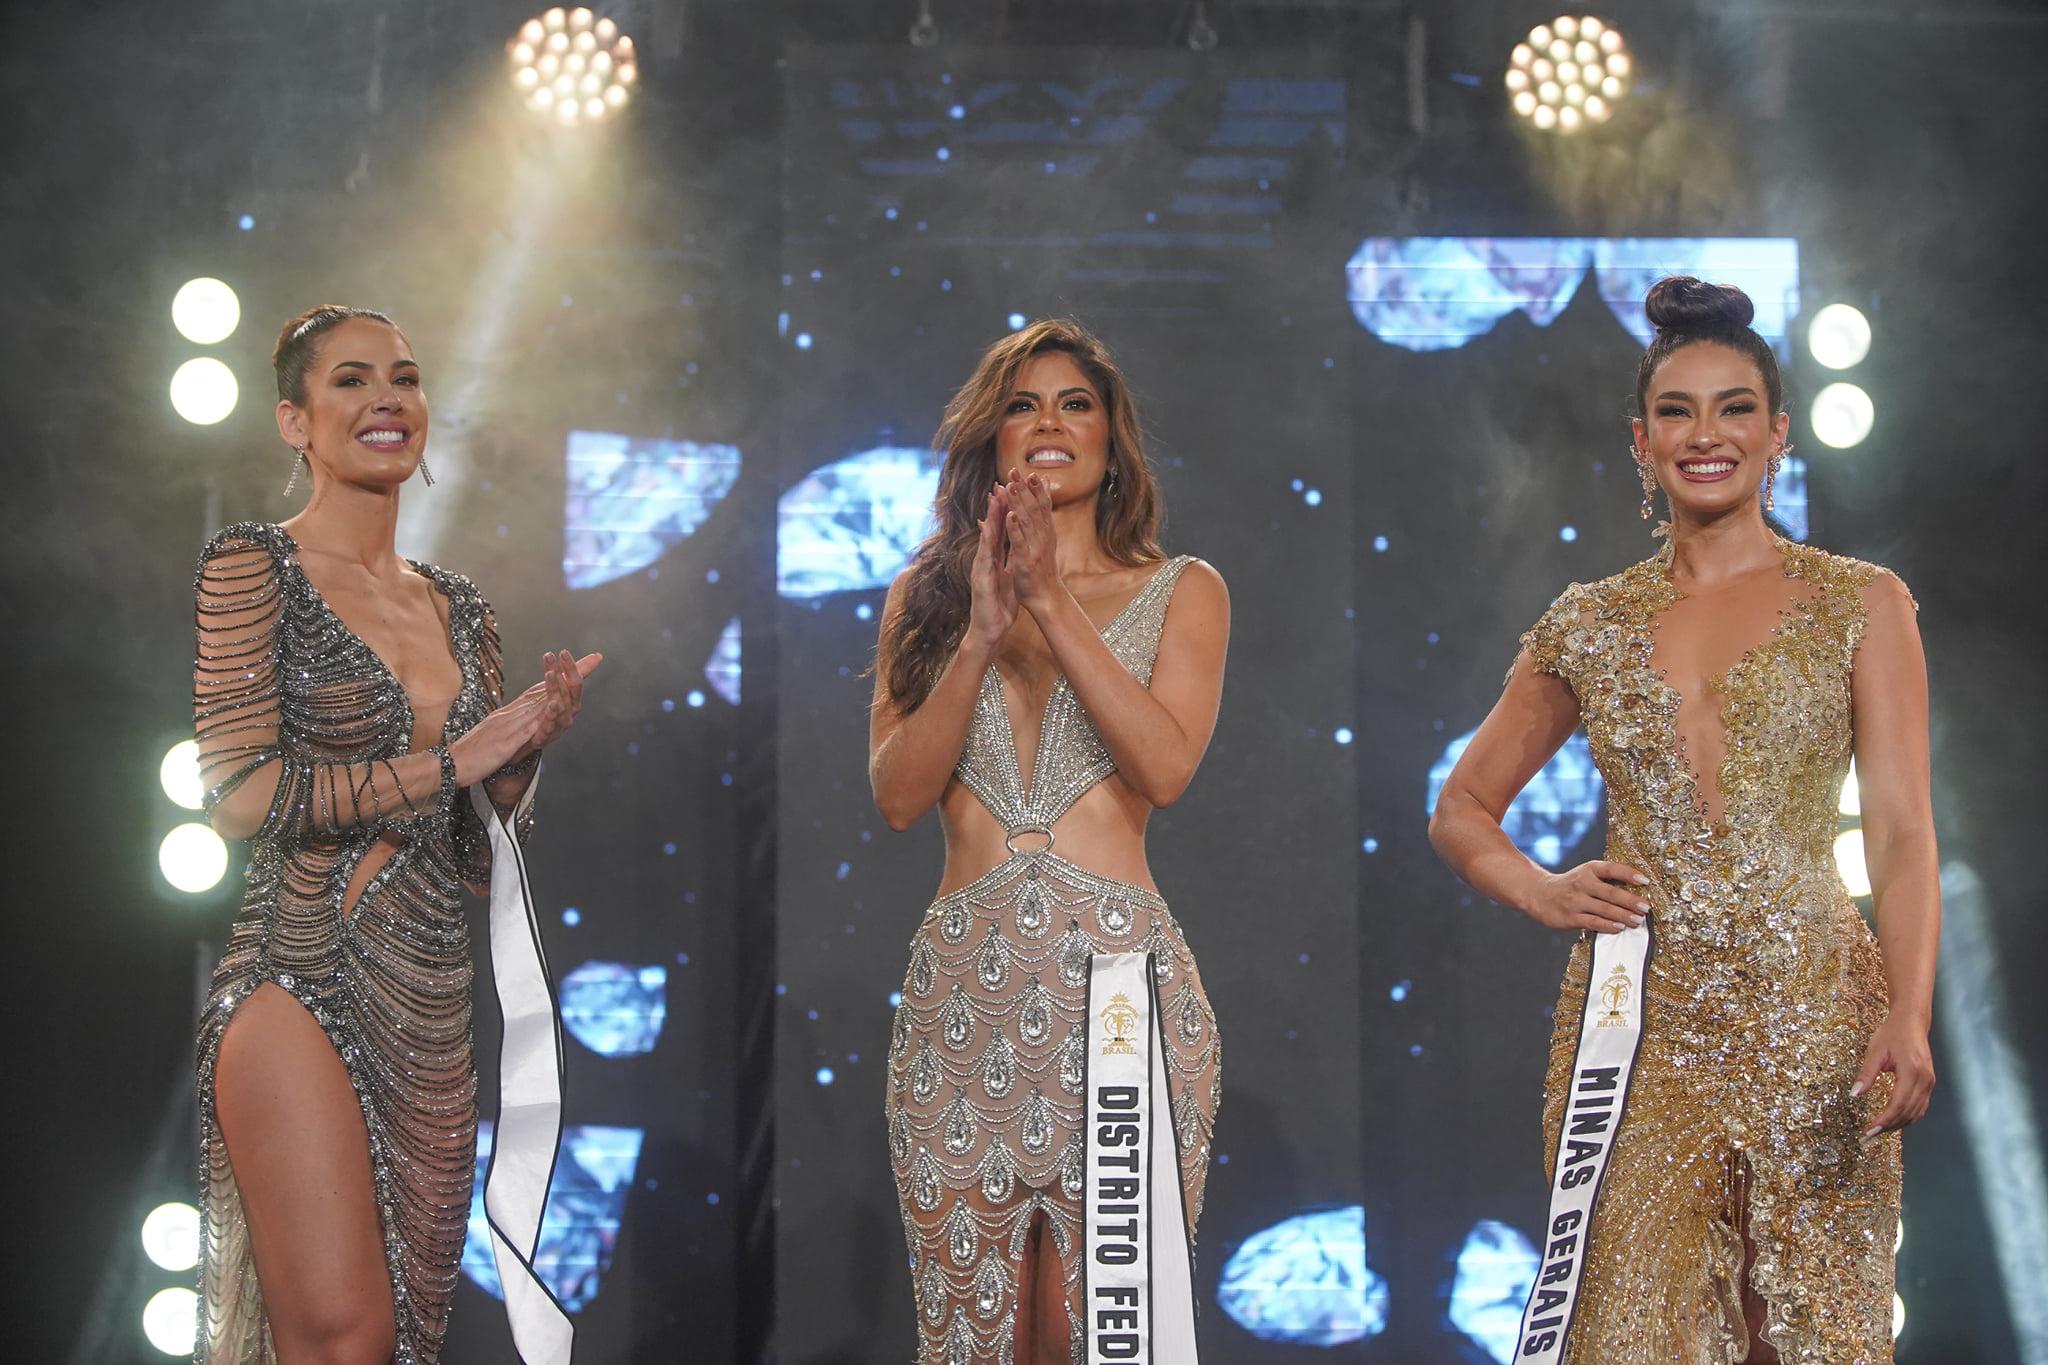 bruna zanardo, 1st runner-up de miss supranational brazil 2020/miss brasil internacional 2017/miss brasil terra 2016. - Página 20 12875910